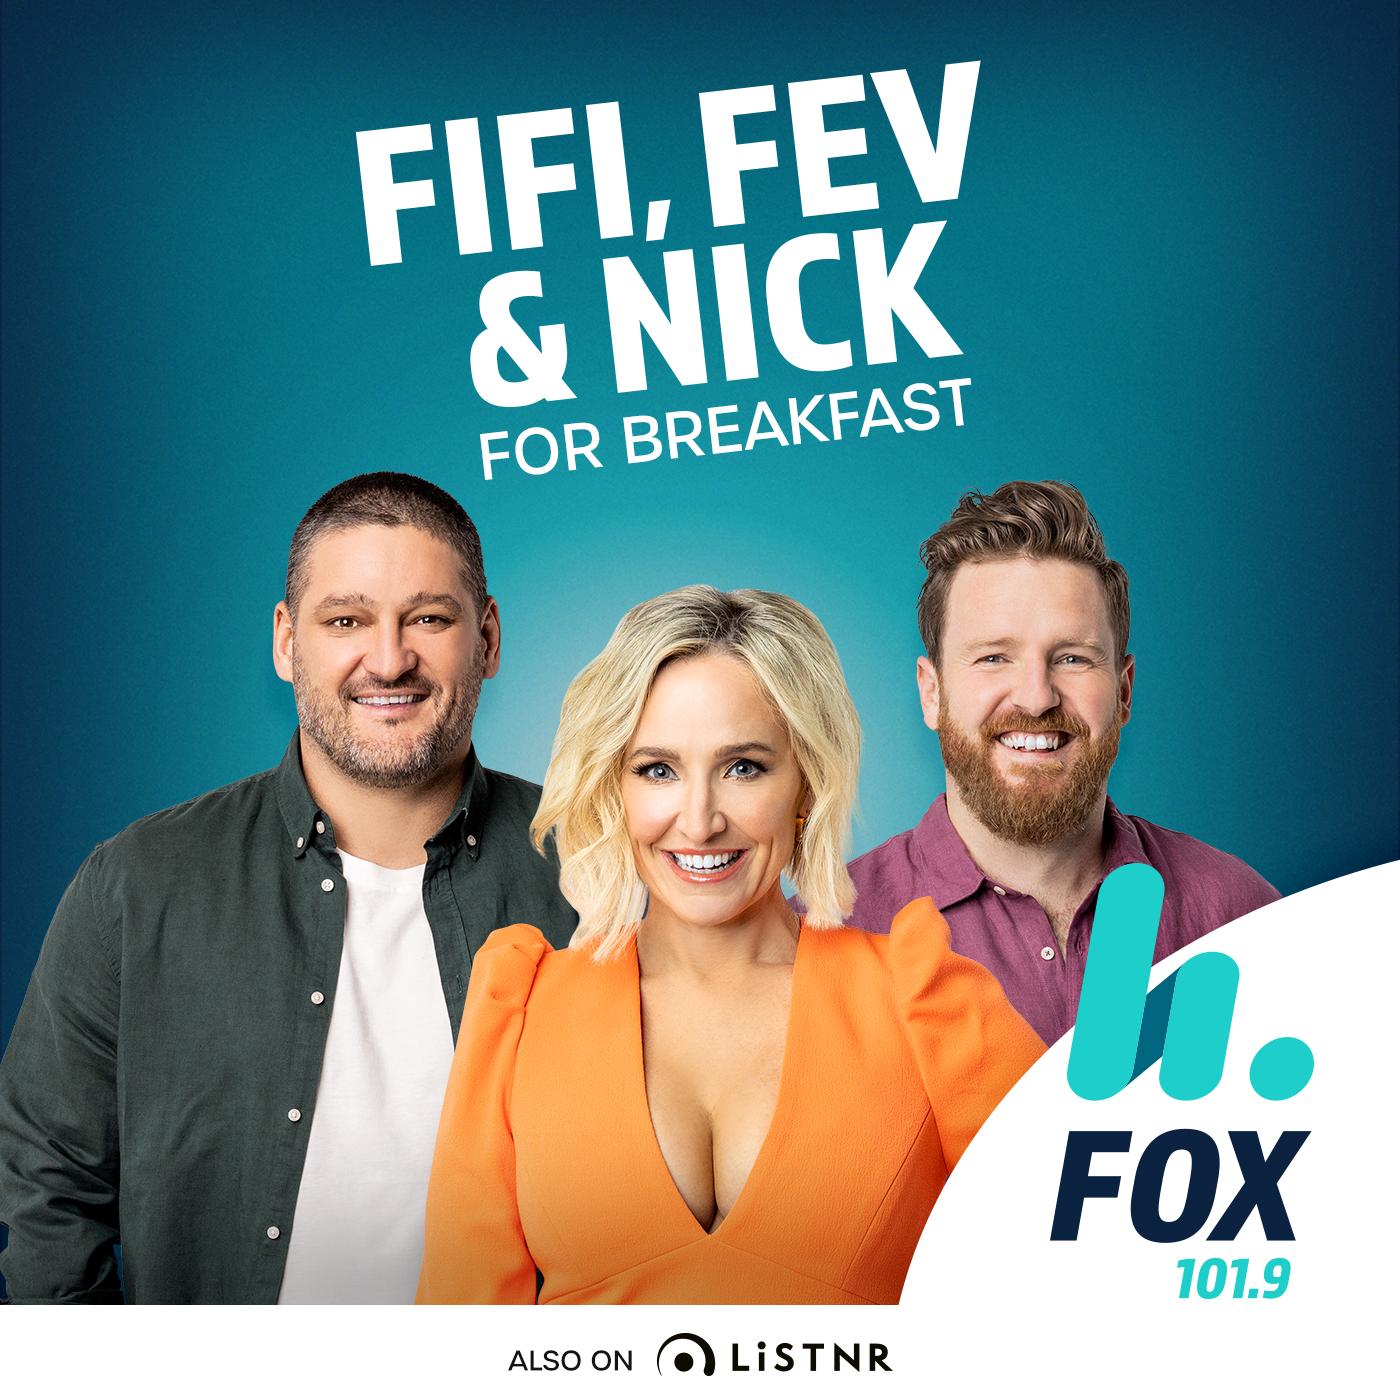 The Fifi, Fev & Byron Catch Up – 101.9 Fox FM Melbourne - Fifi Box, Brendan Fevola & Byron Cooke